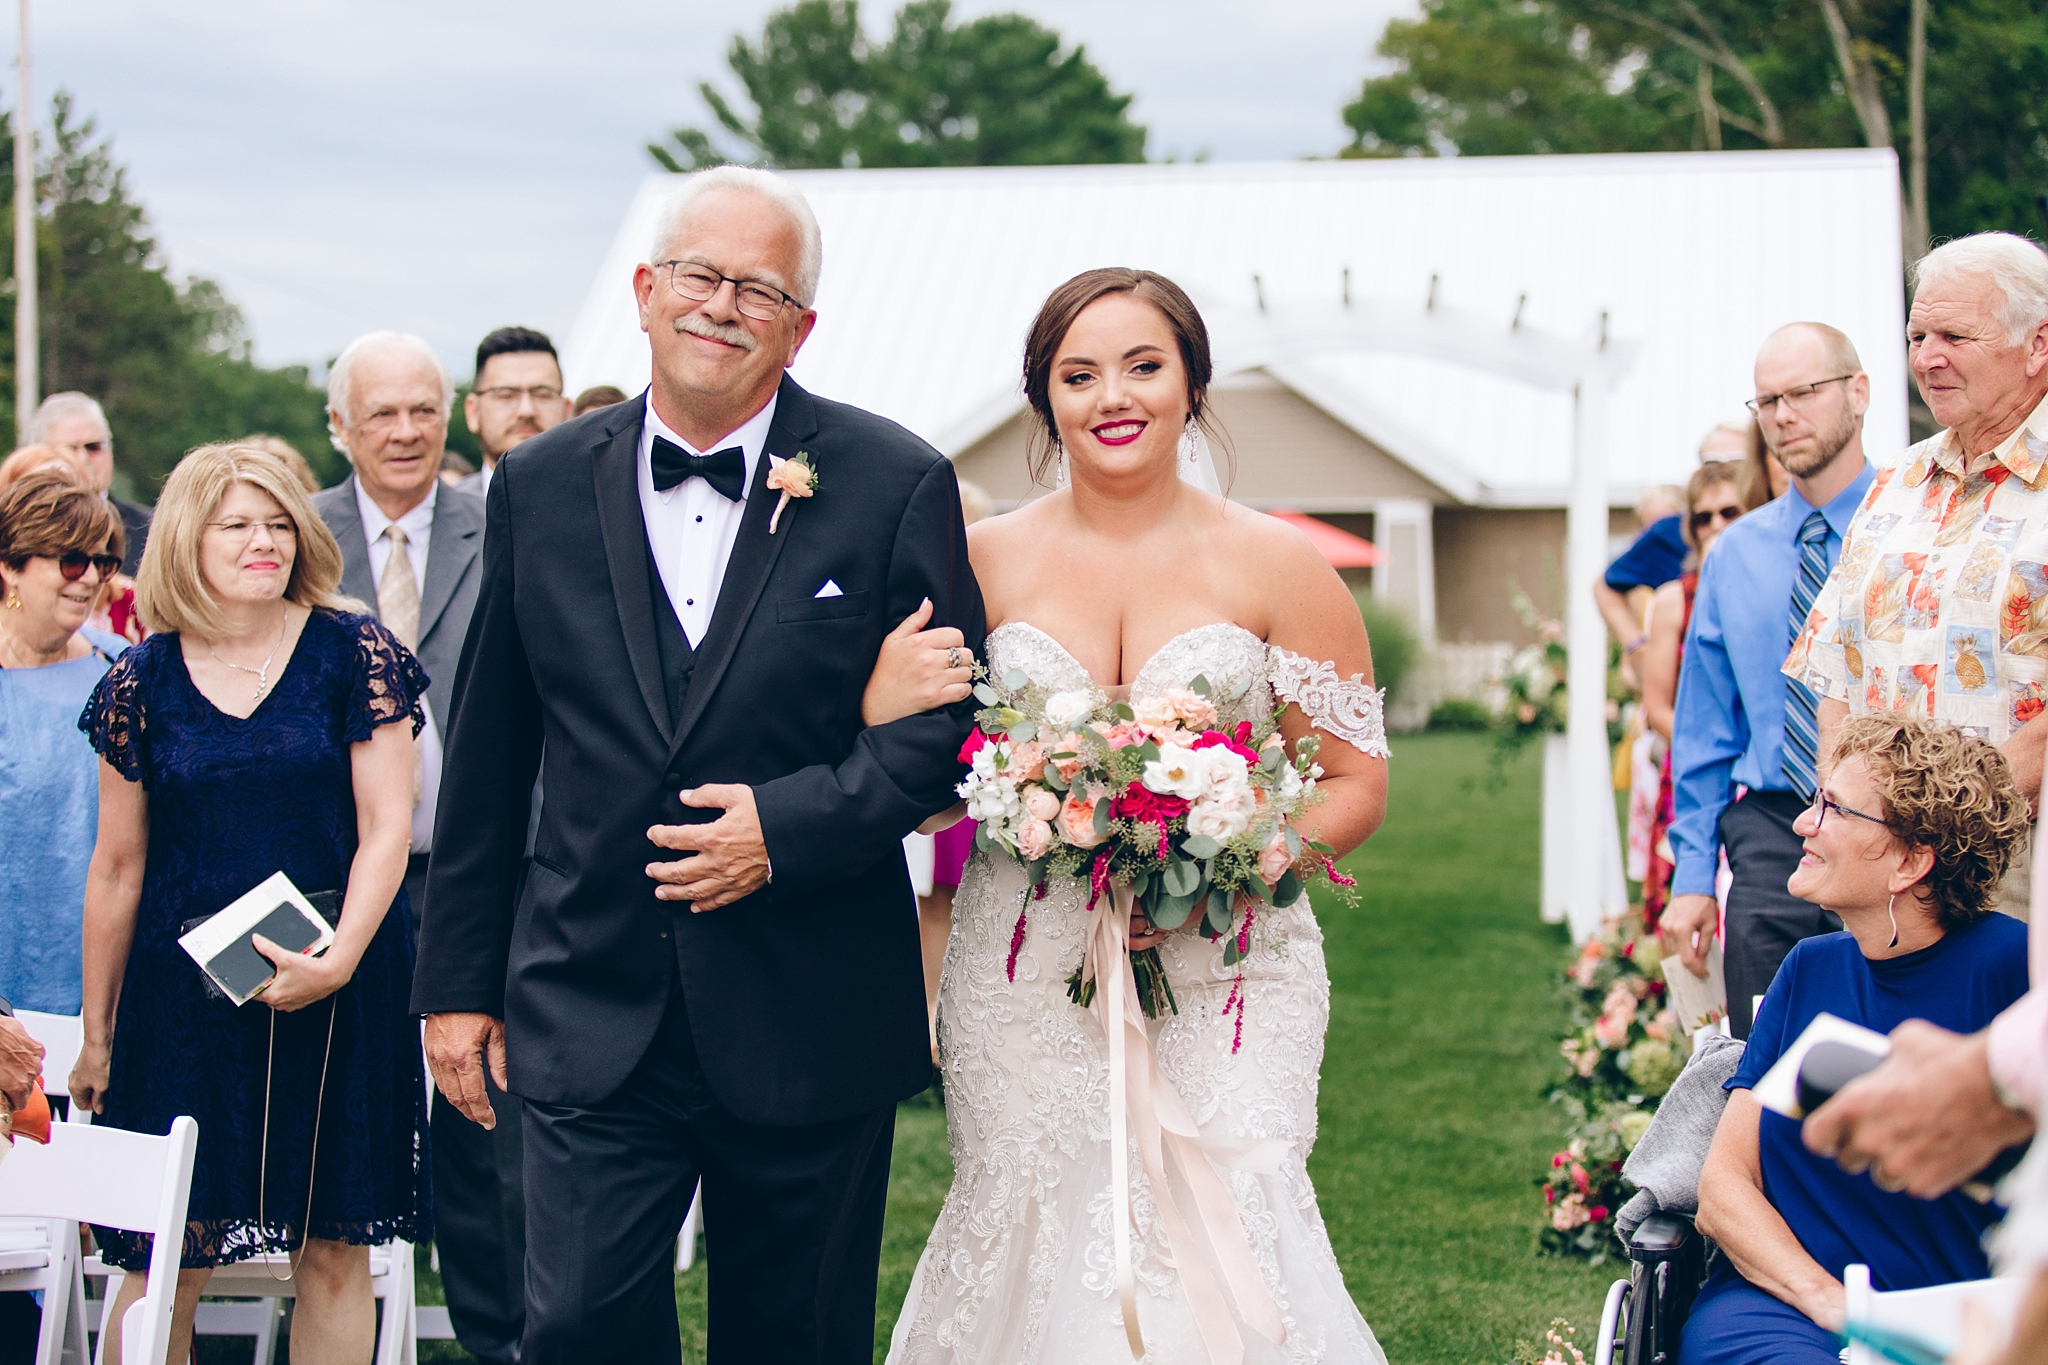 baker-lofts-holland-michigan-wedding-photographer_0352.jpg